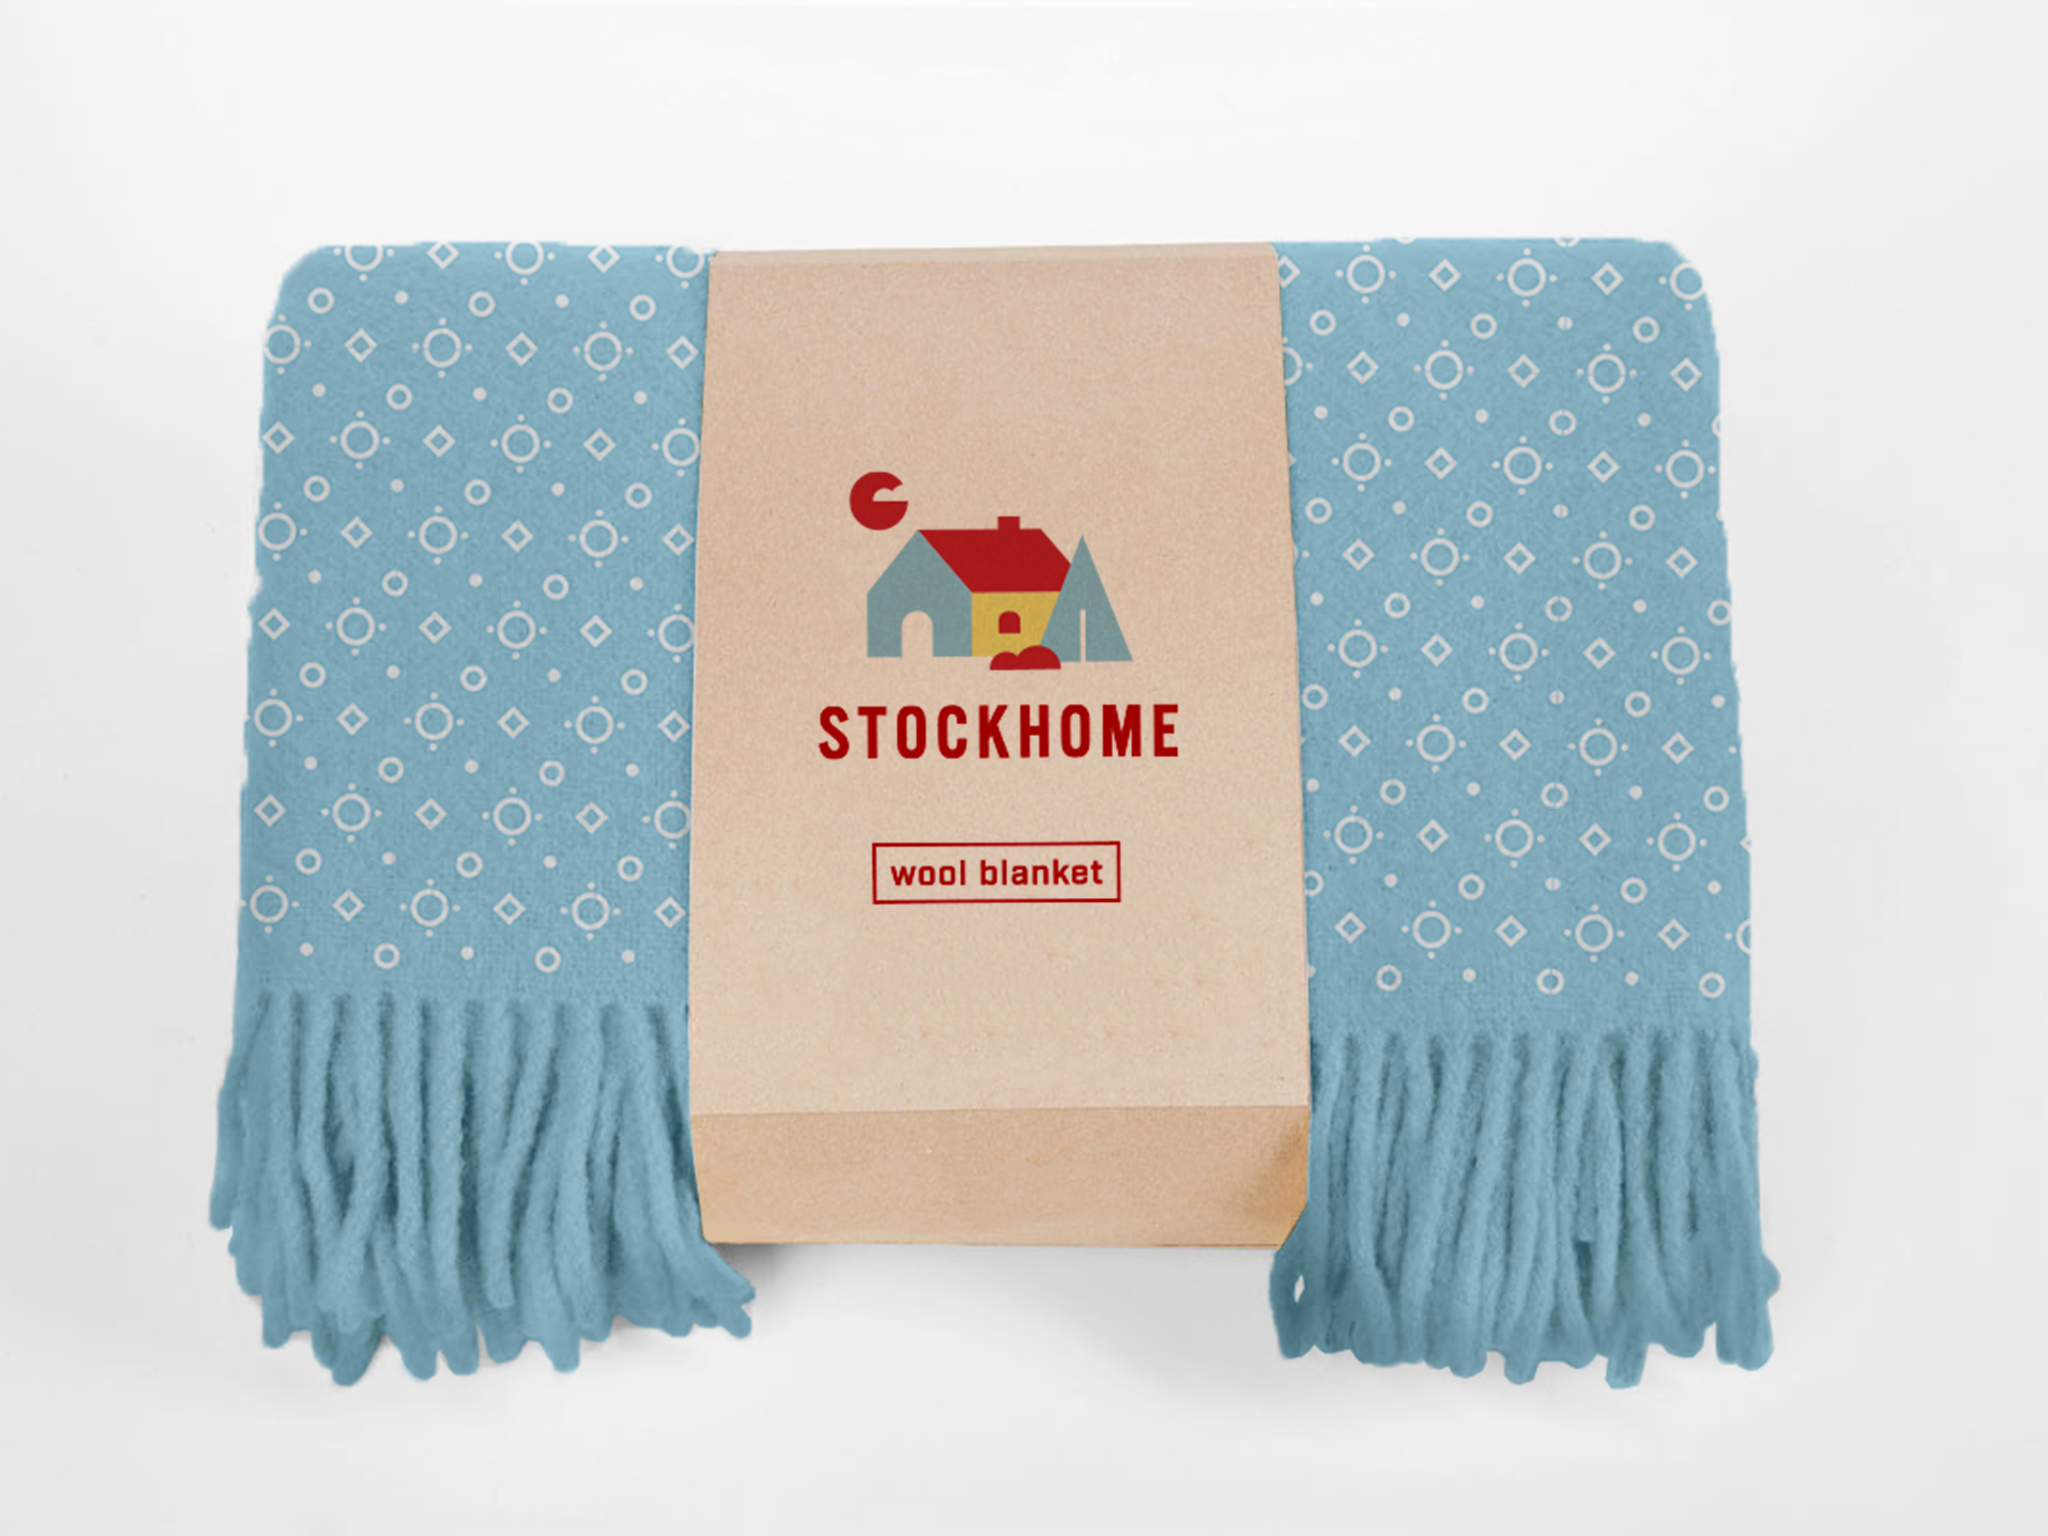 Stockhome